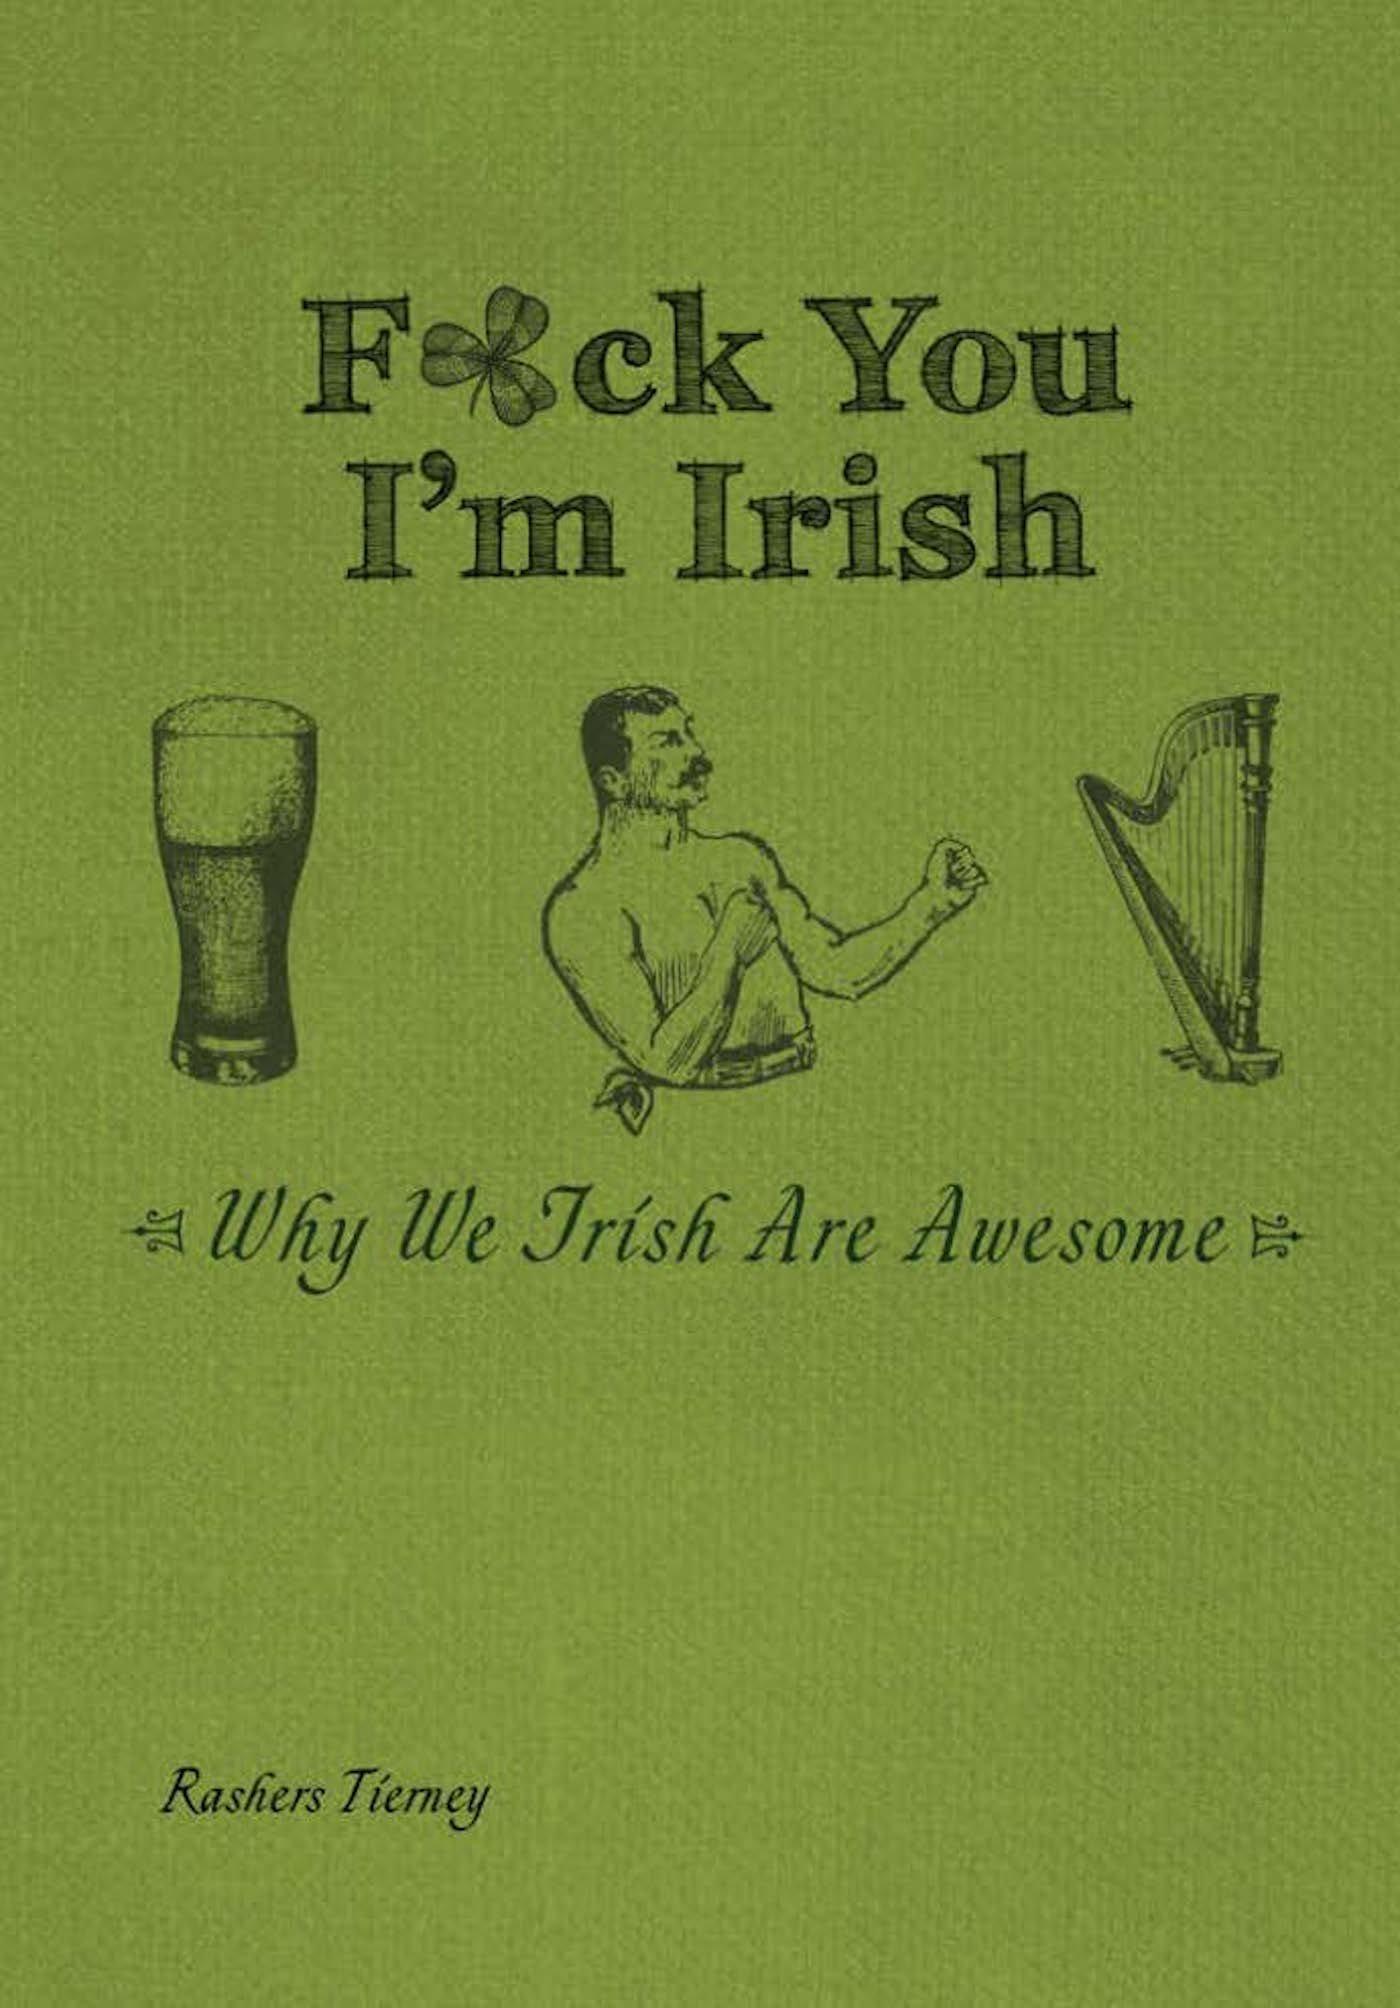 Download F*ck You, I'm Irish: Why We Irish Are Awesome ebook